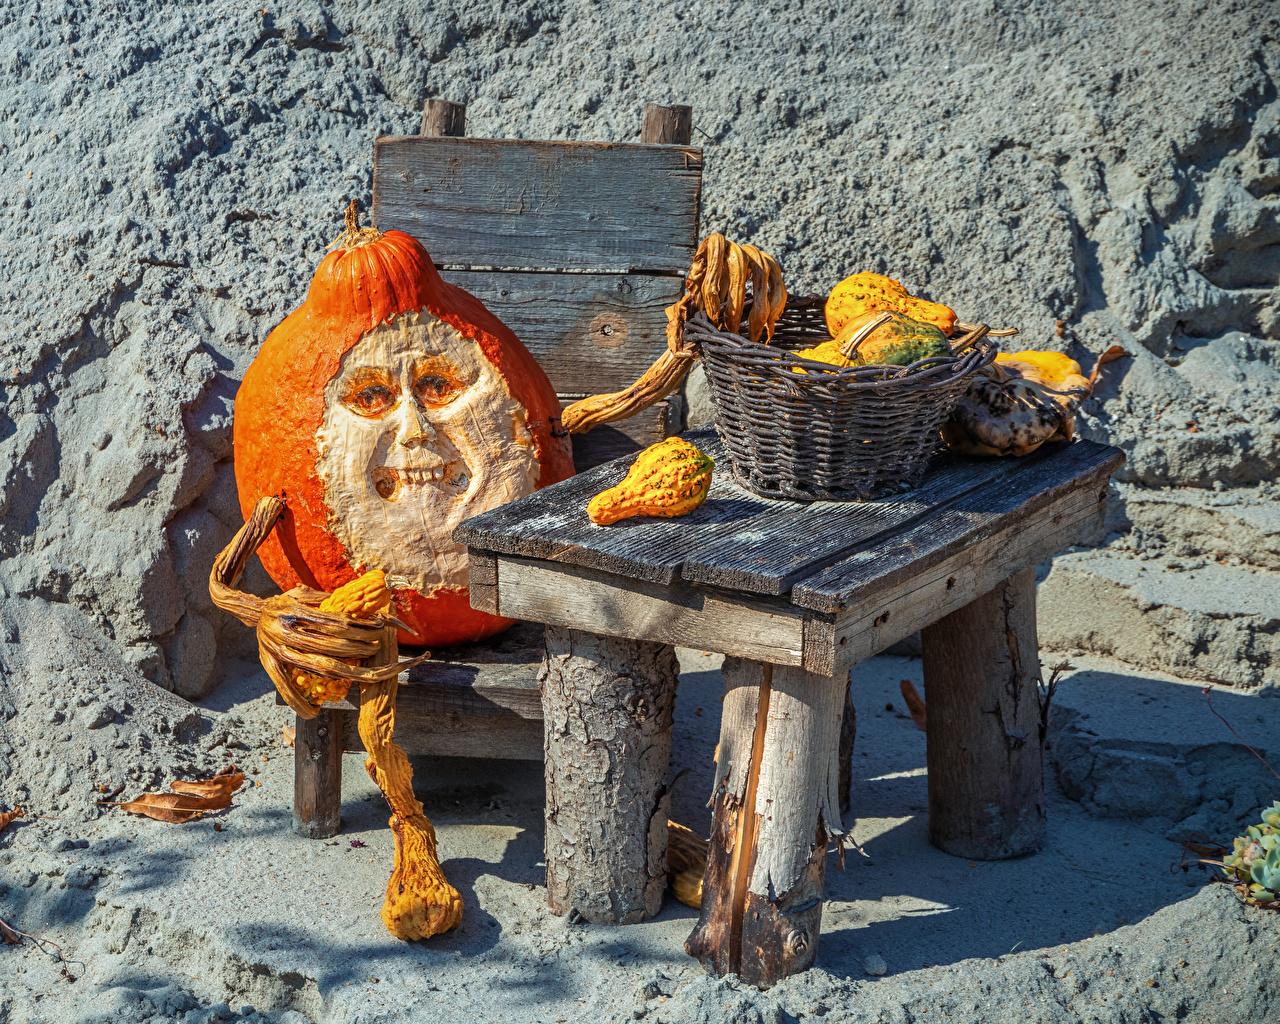 Photos ugly Old man Pumpkin Halloween Creative Wicker basket Table scary terrible Horrible